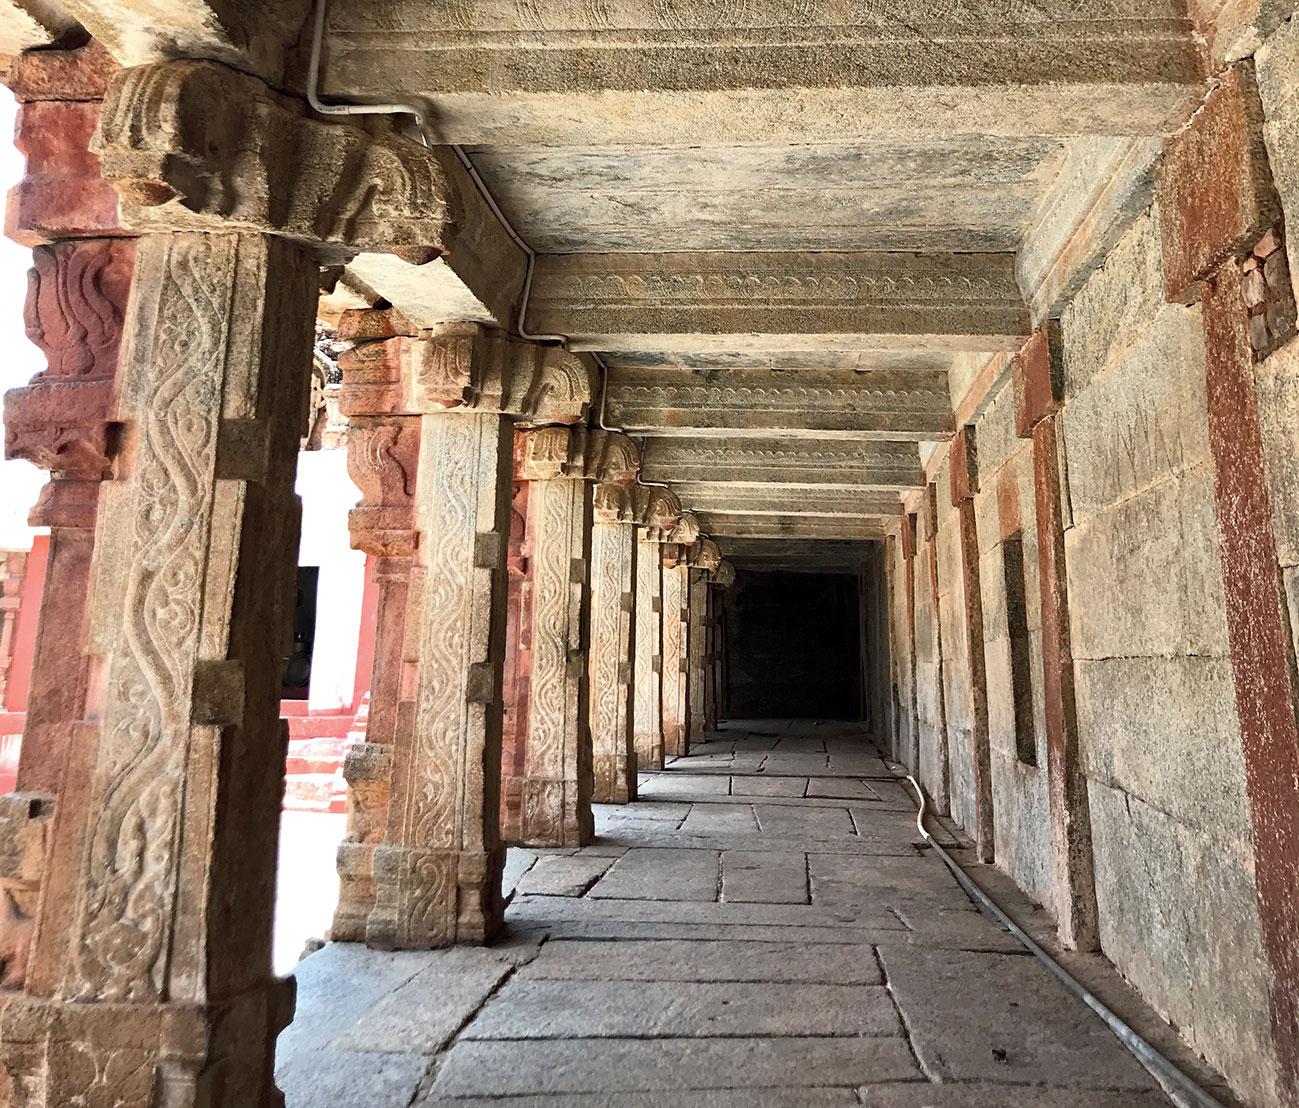 The 9th century Bhoganandishwara Temple